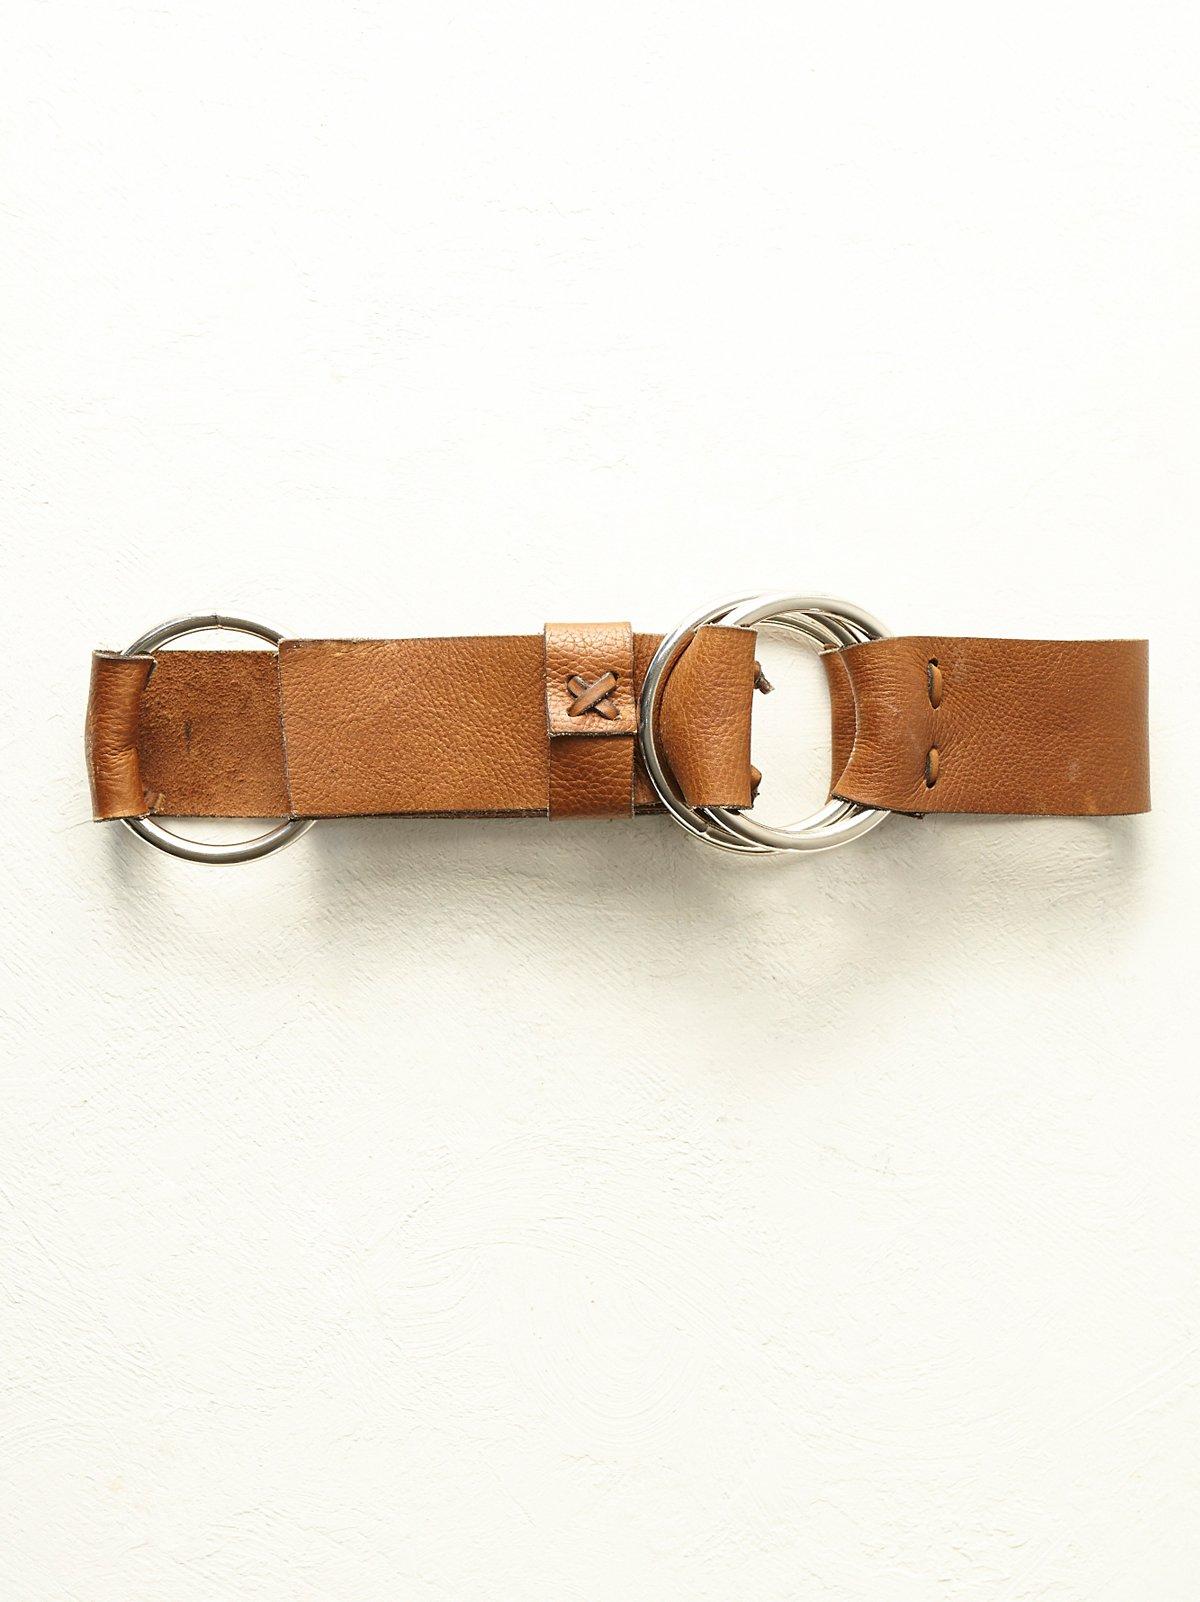 FP Vintage Leather Hoop Belt